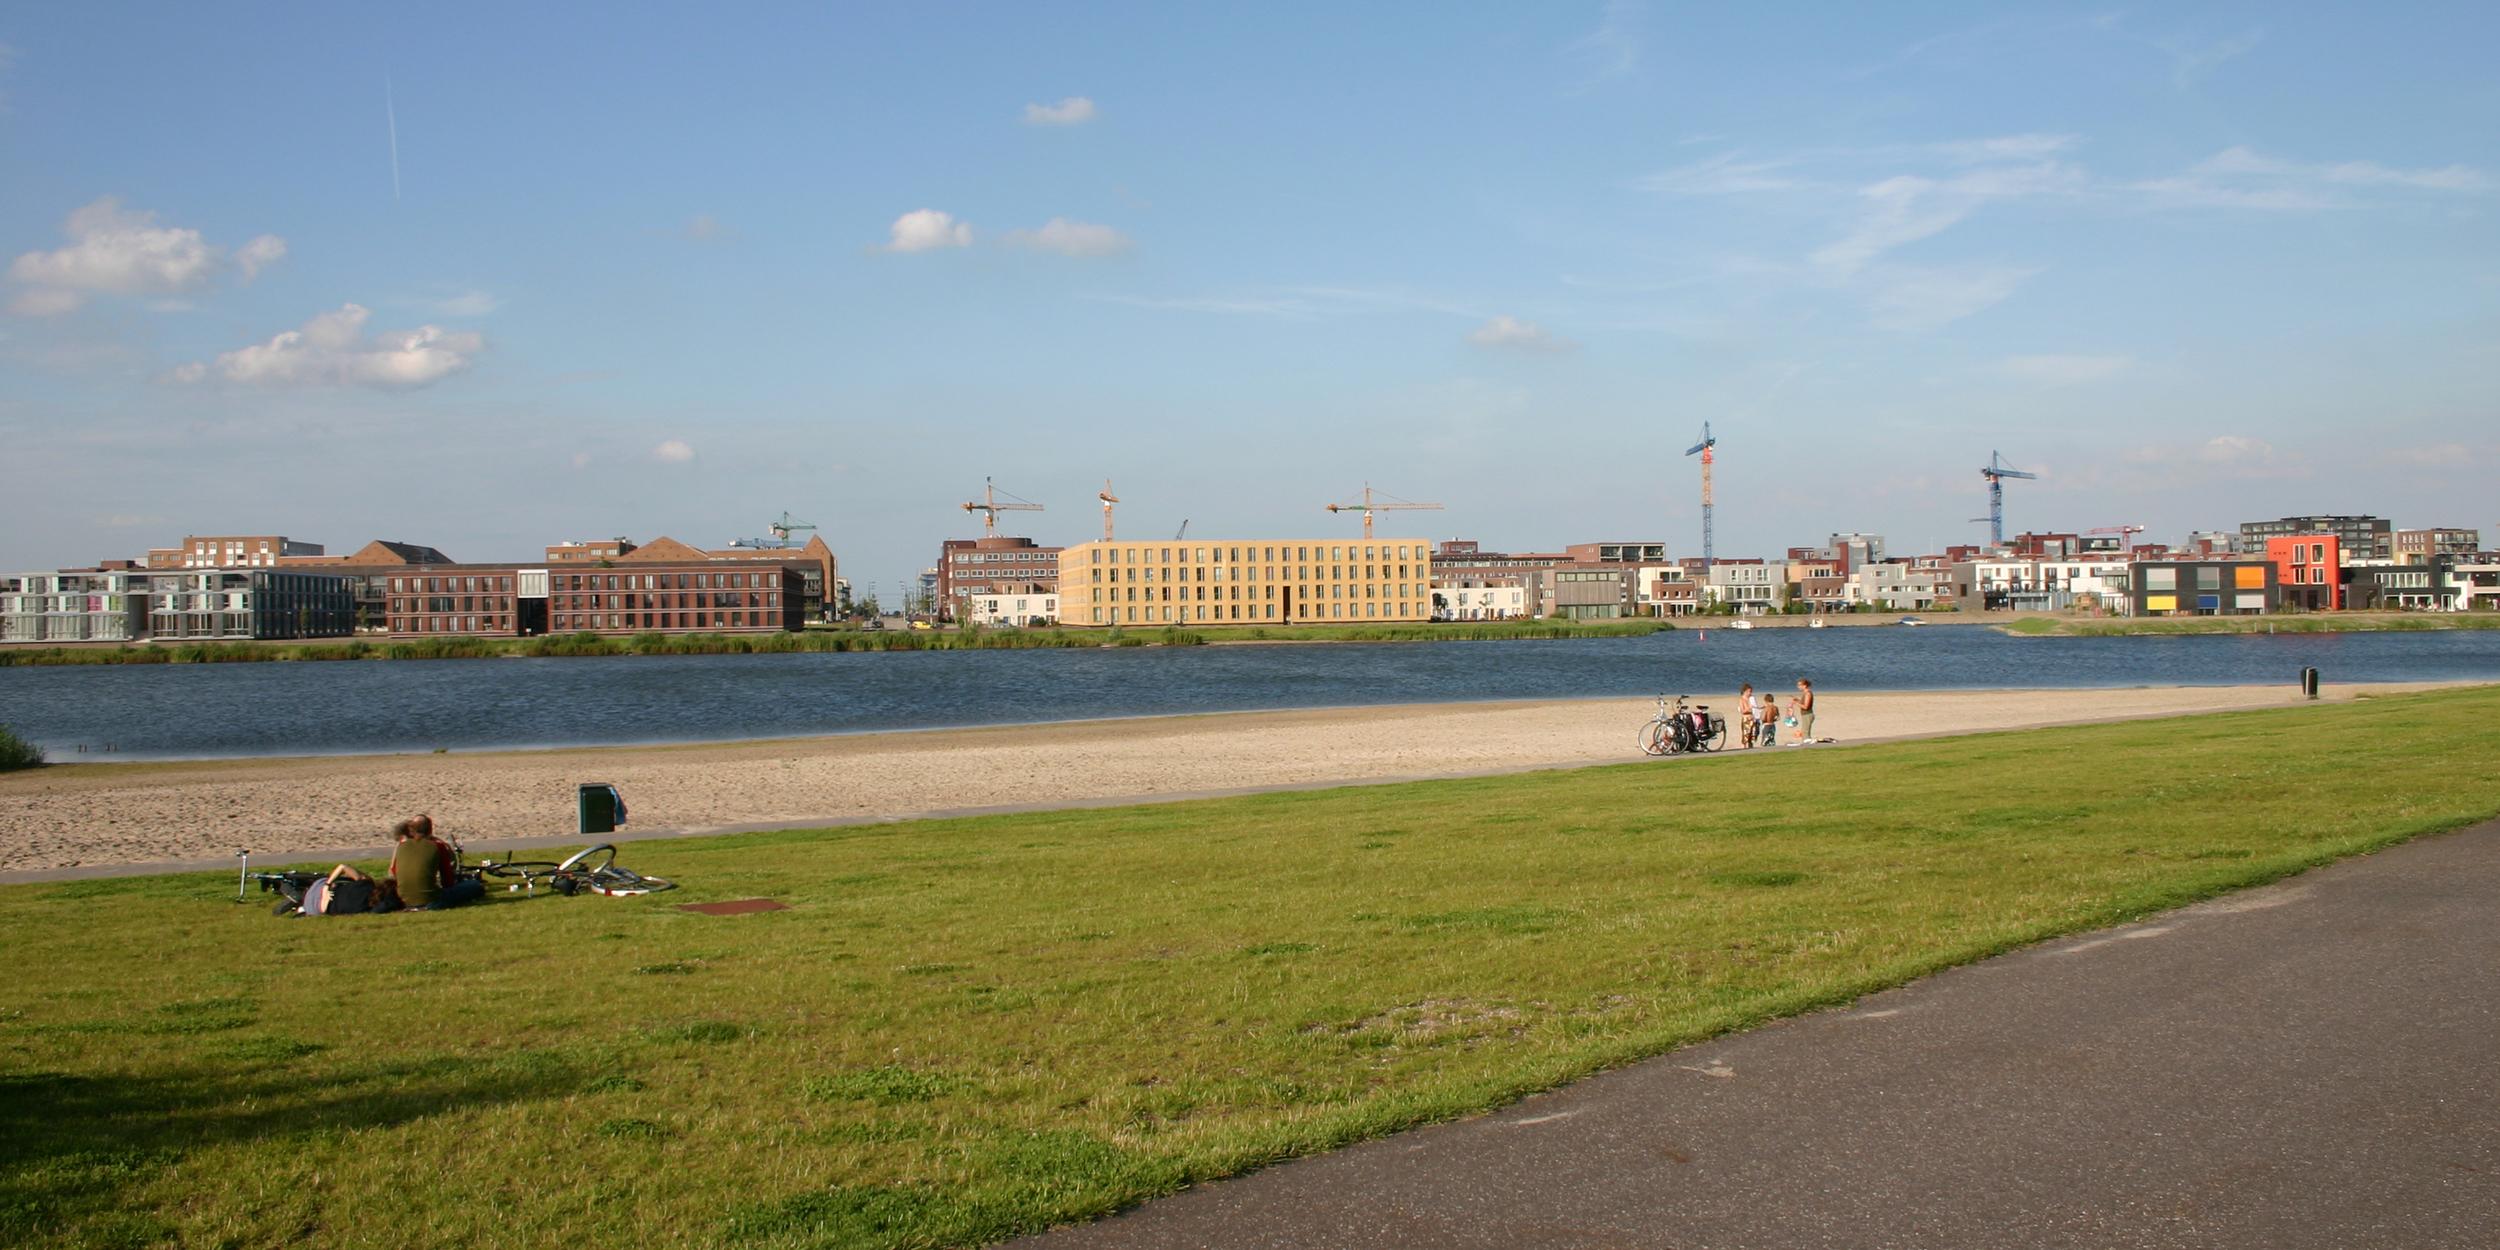 ADC_Ijburg_2008_0437.jpg